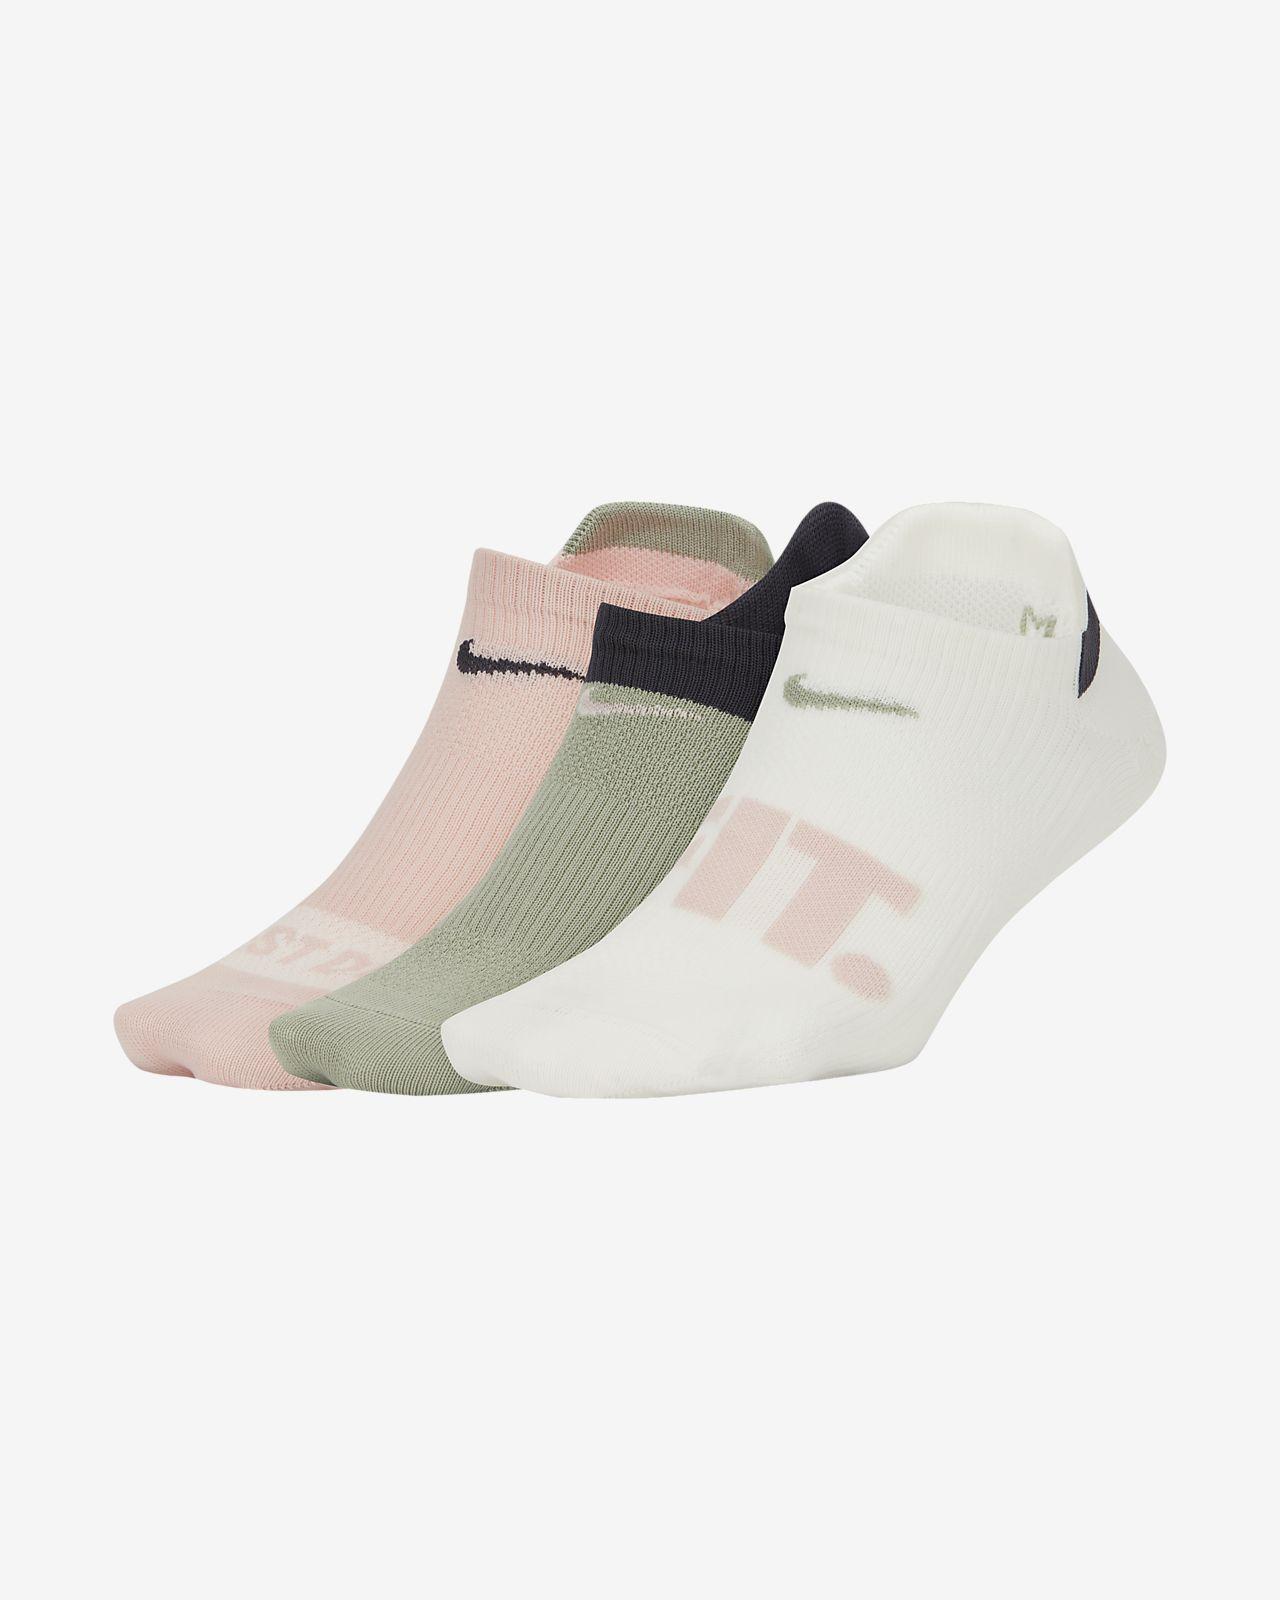 Nike Everyday Plus Lightweight No-Show Training Socks (3 Pairs)